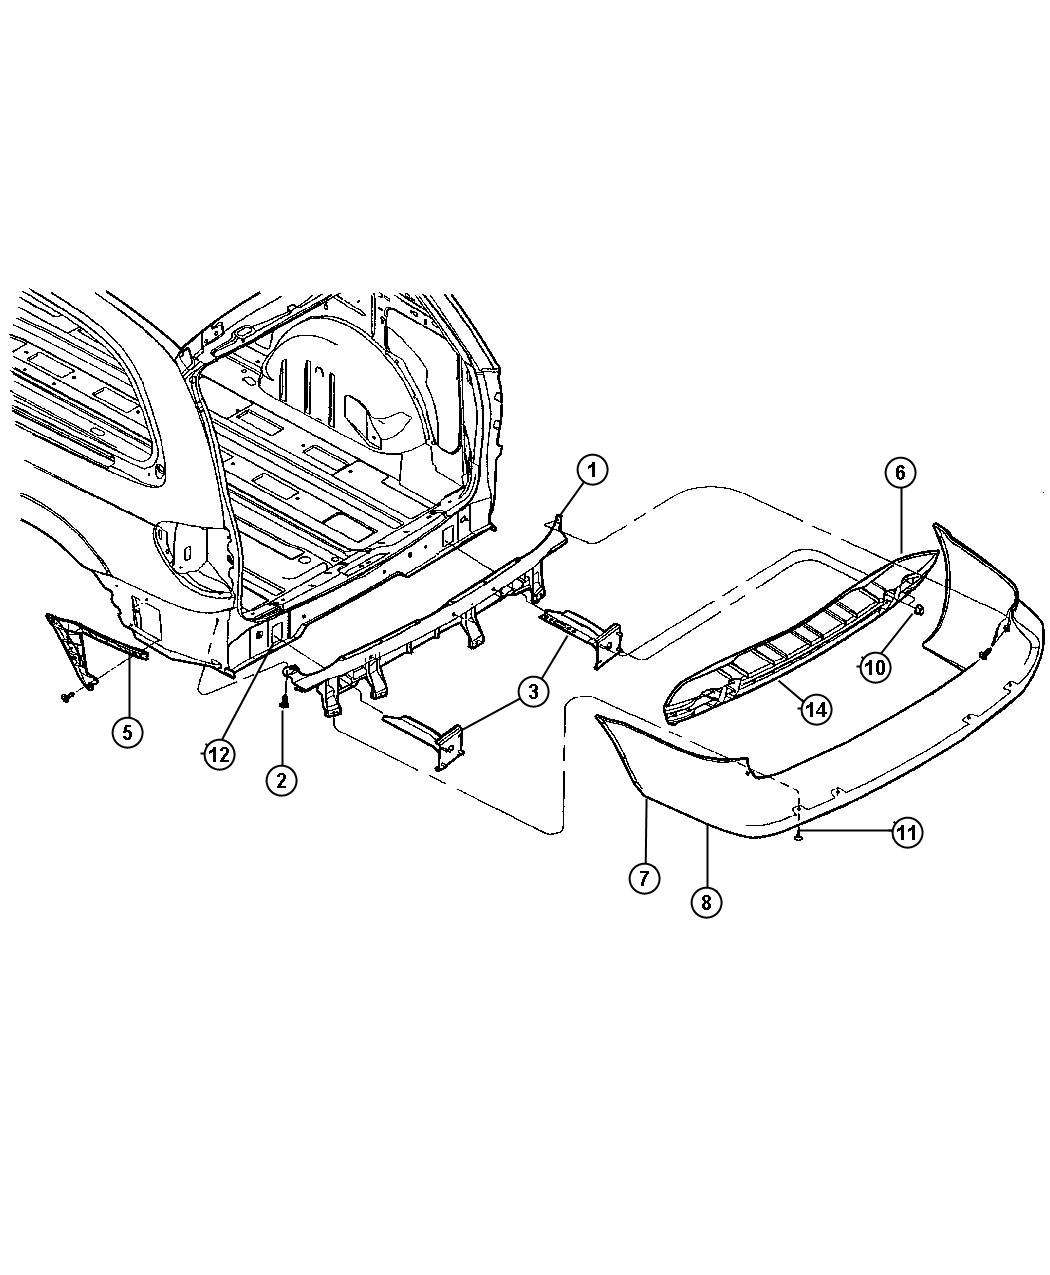 04857273ab - dodge scuff pad  rear fascia  carbon black